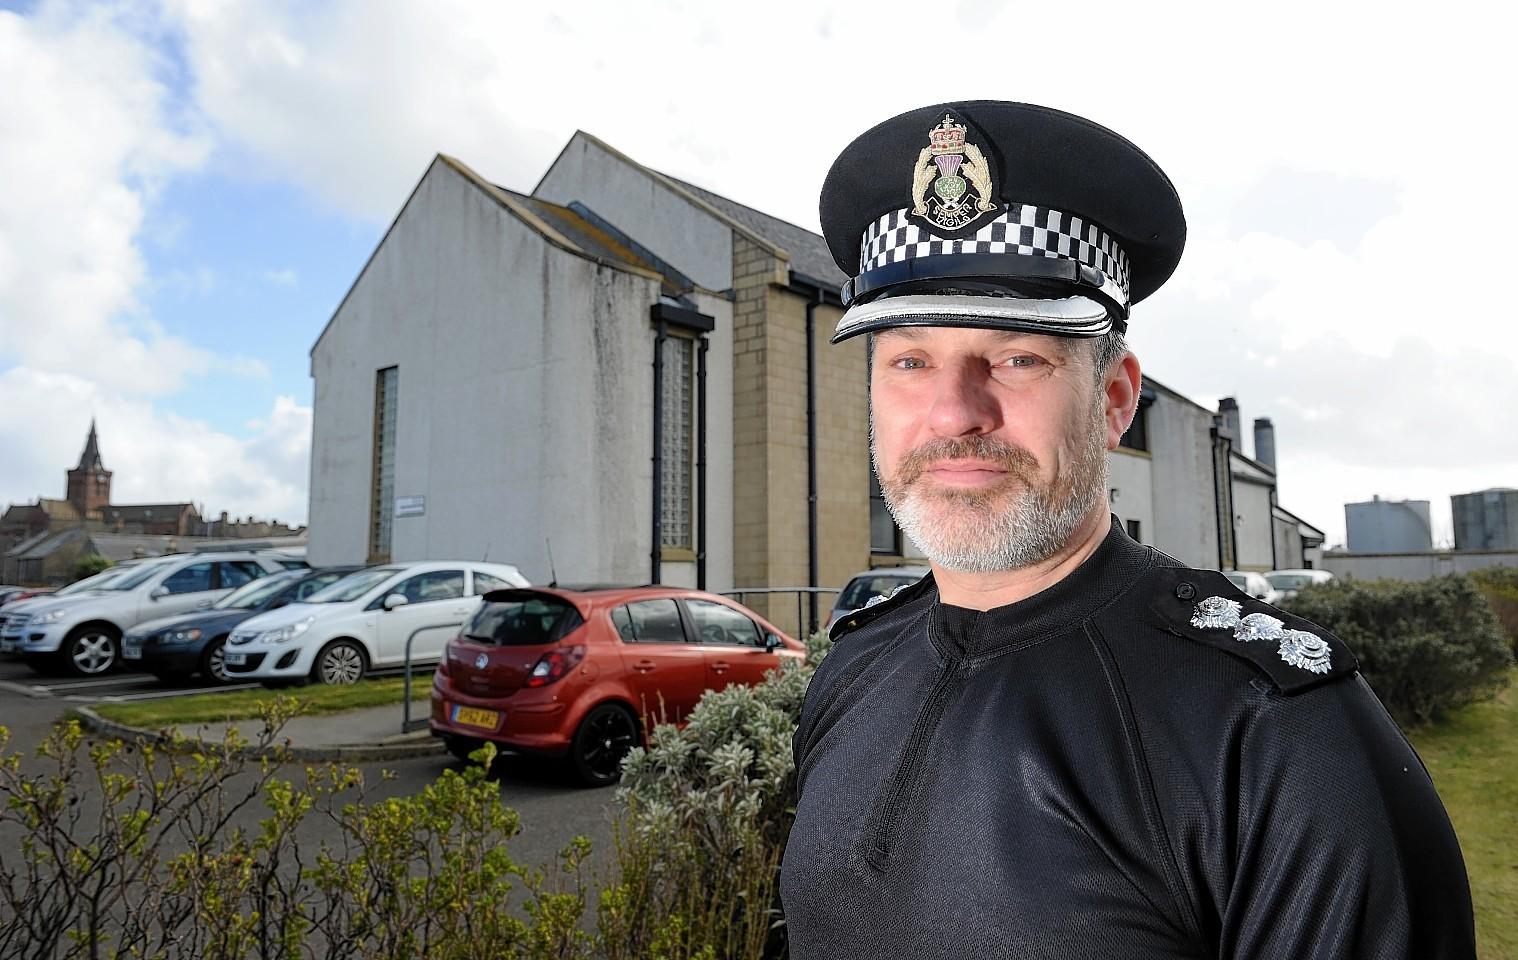 Orkney area commander Chief Inspector Gordon Deans